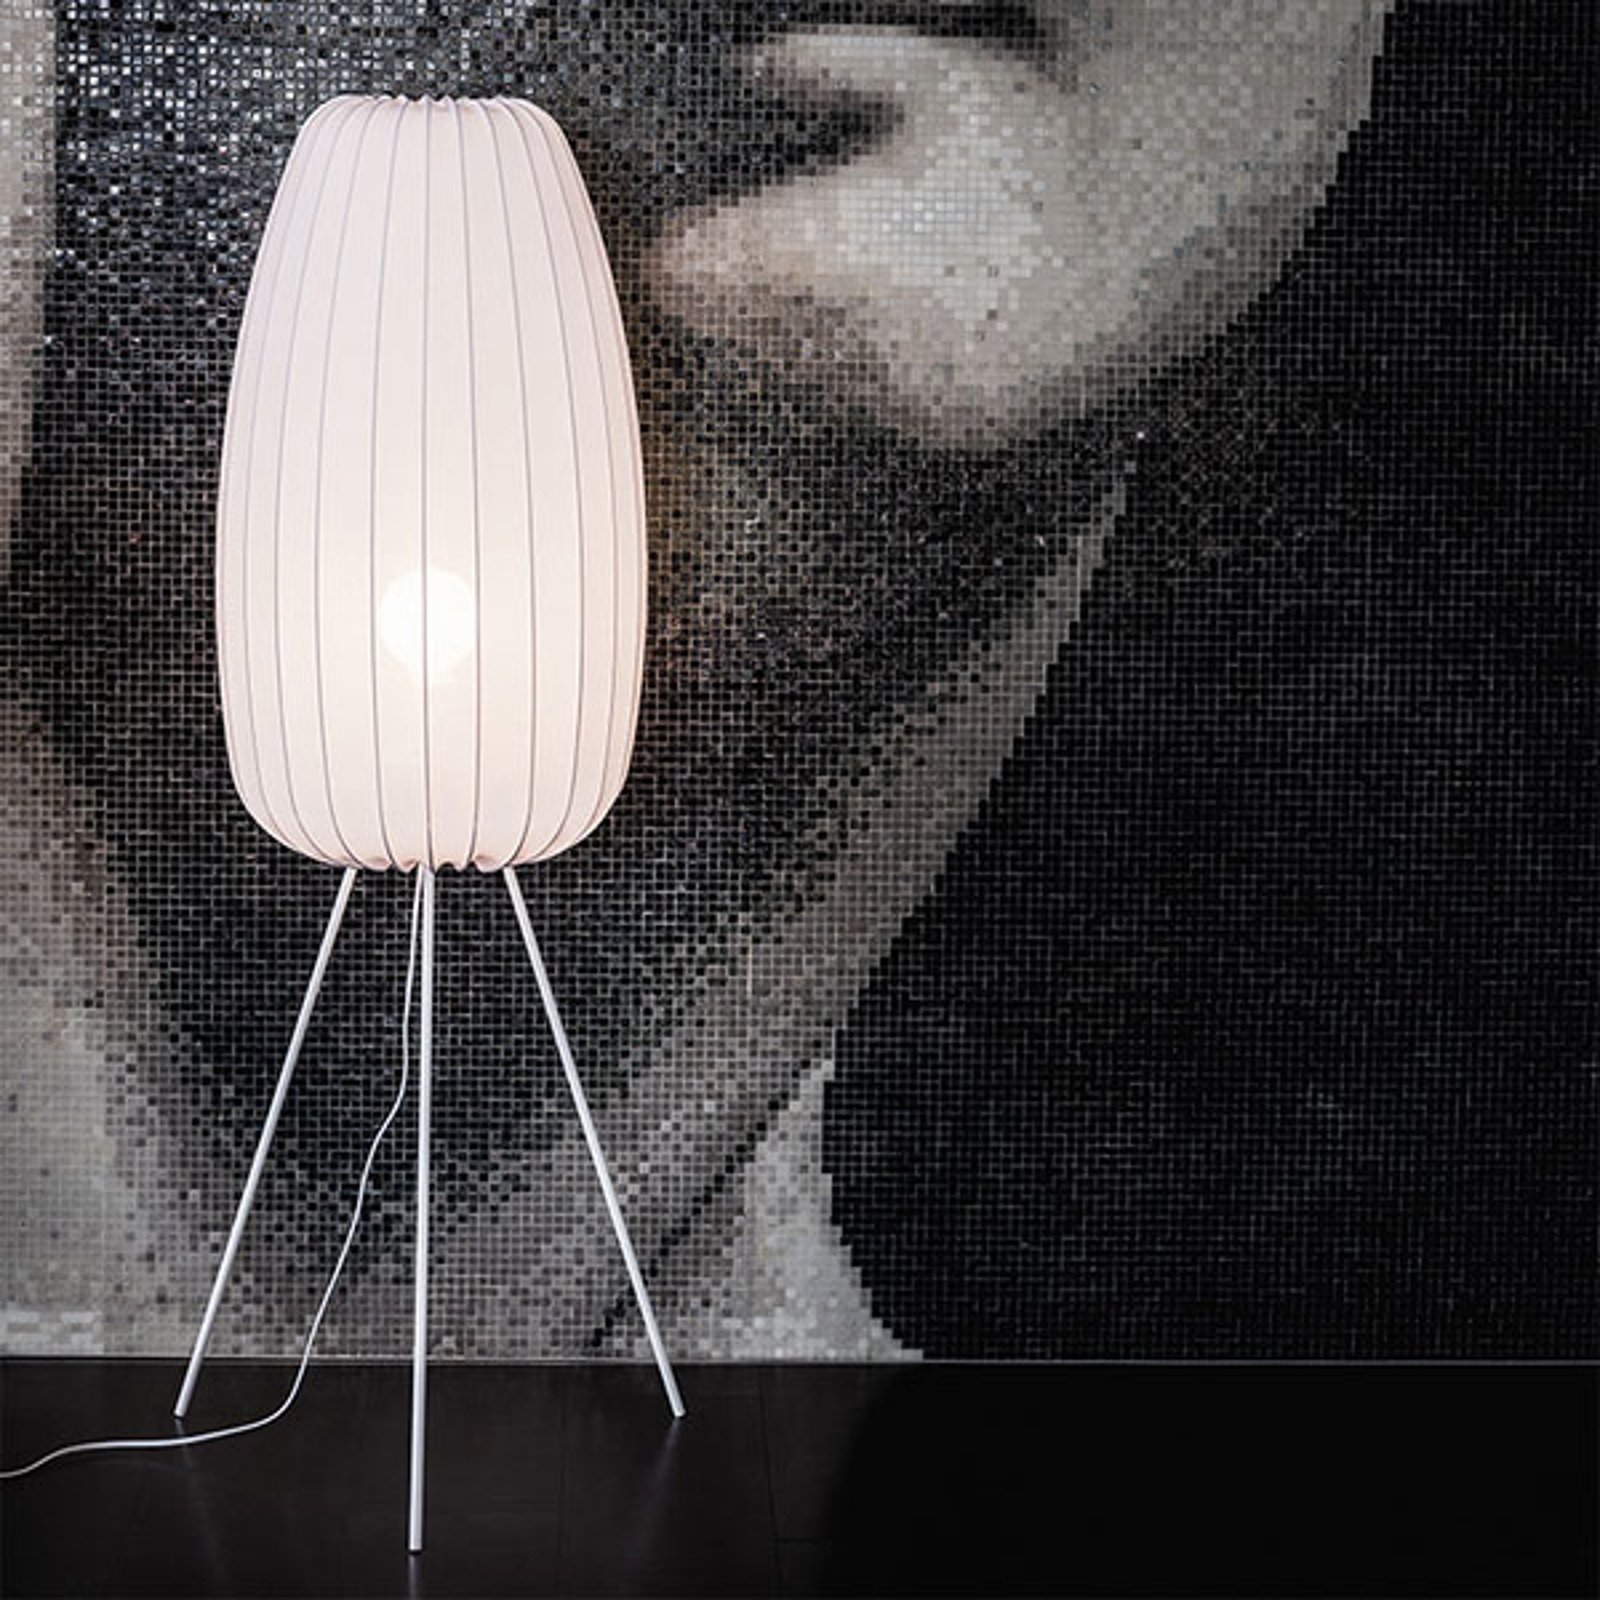 Gulvlampe Muse L i hvit med lykraskjerm